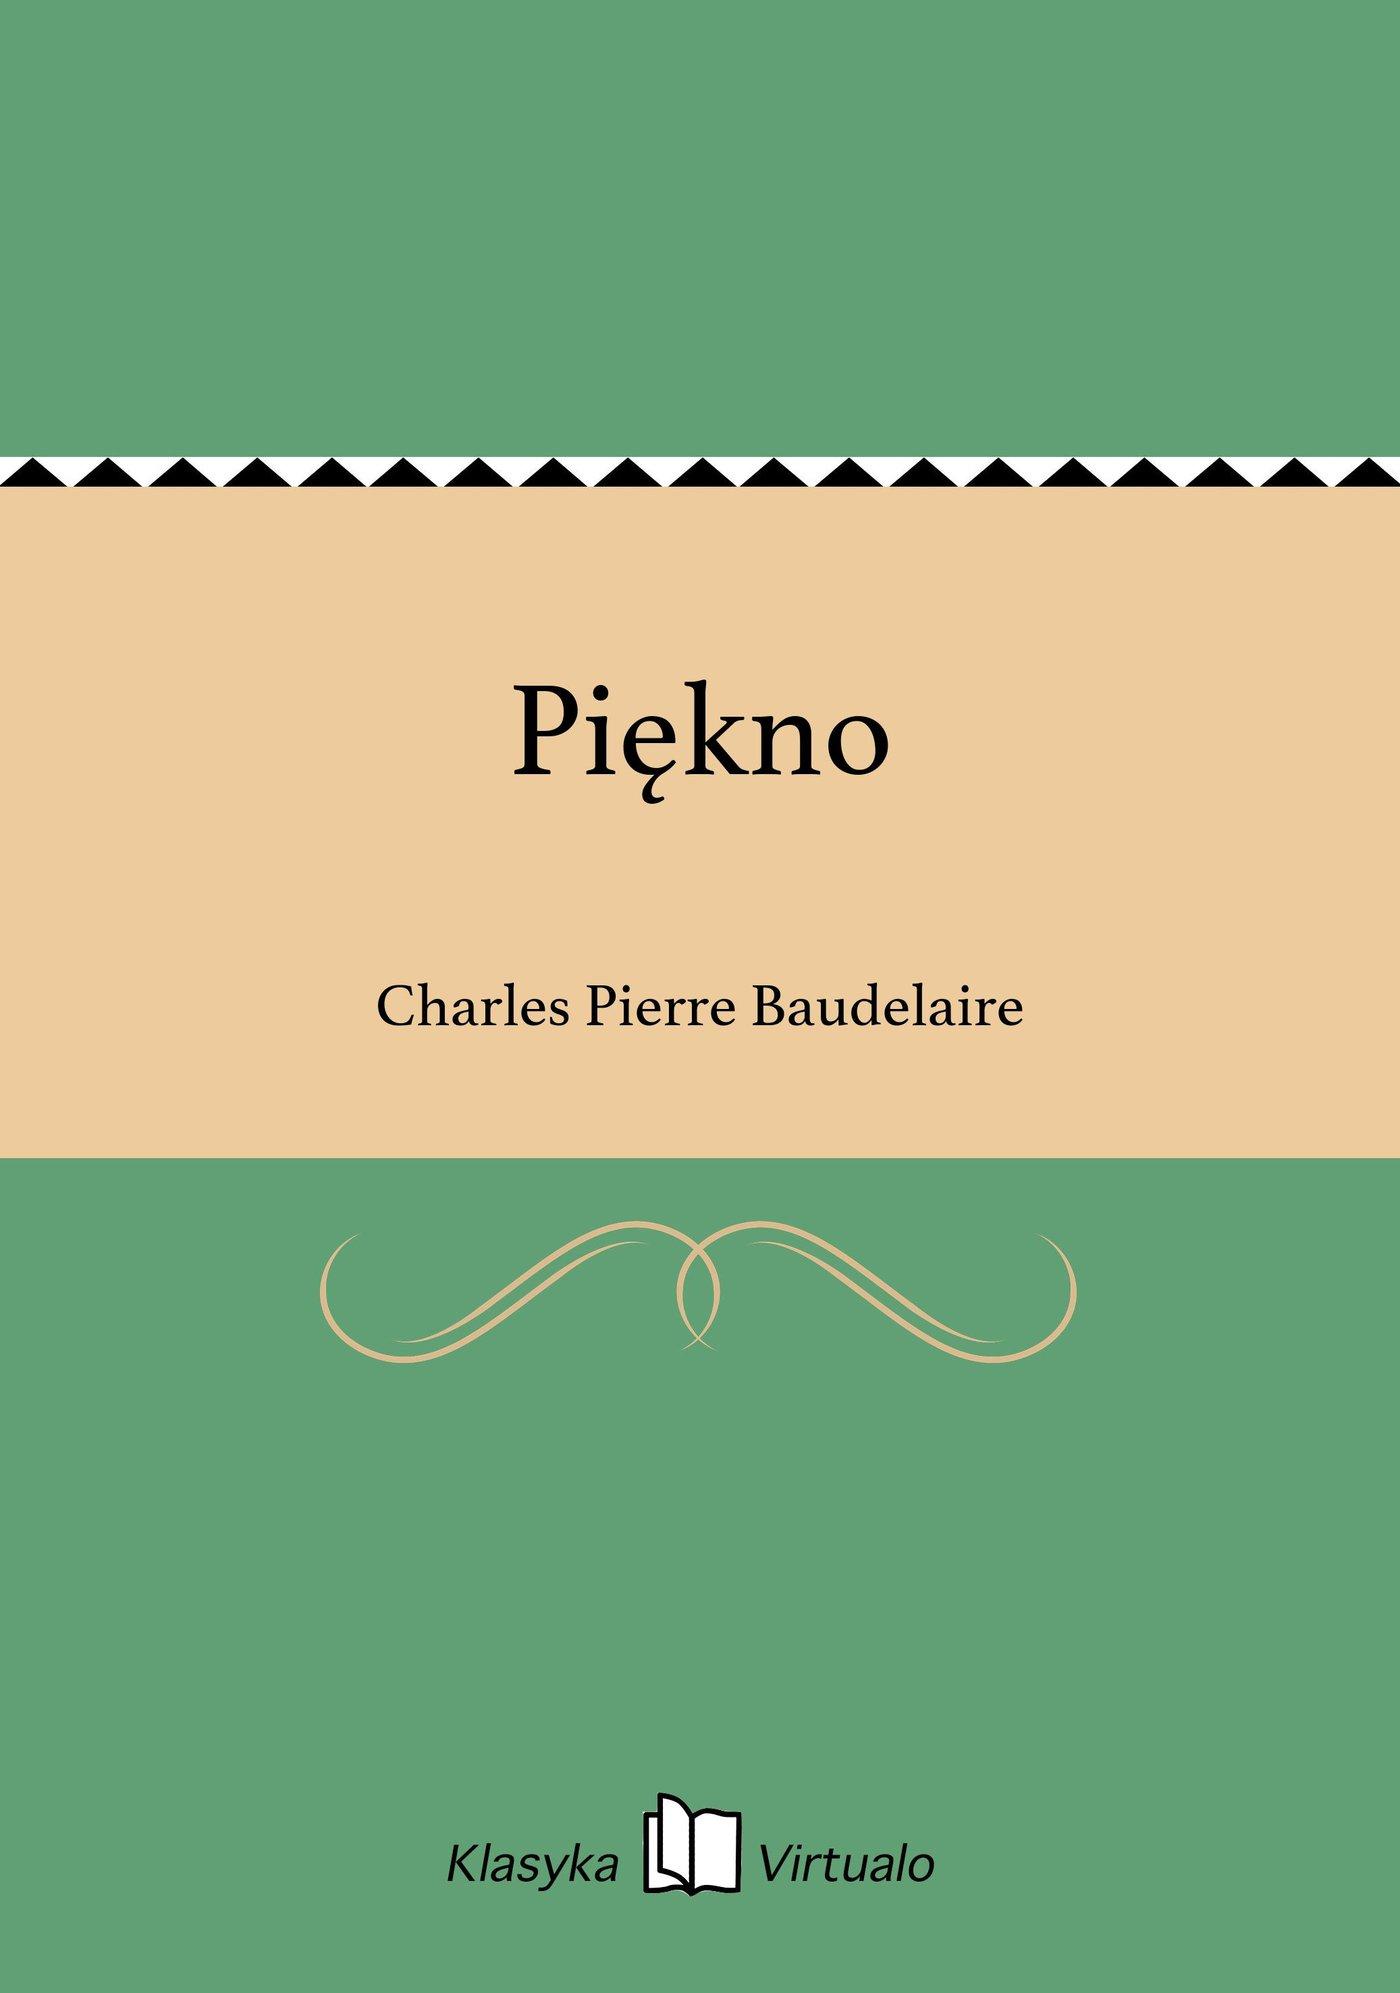 Piękno - Ebook (Książka EPUB) do pobrania w formacie EPUB